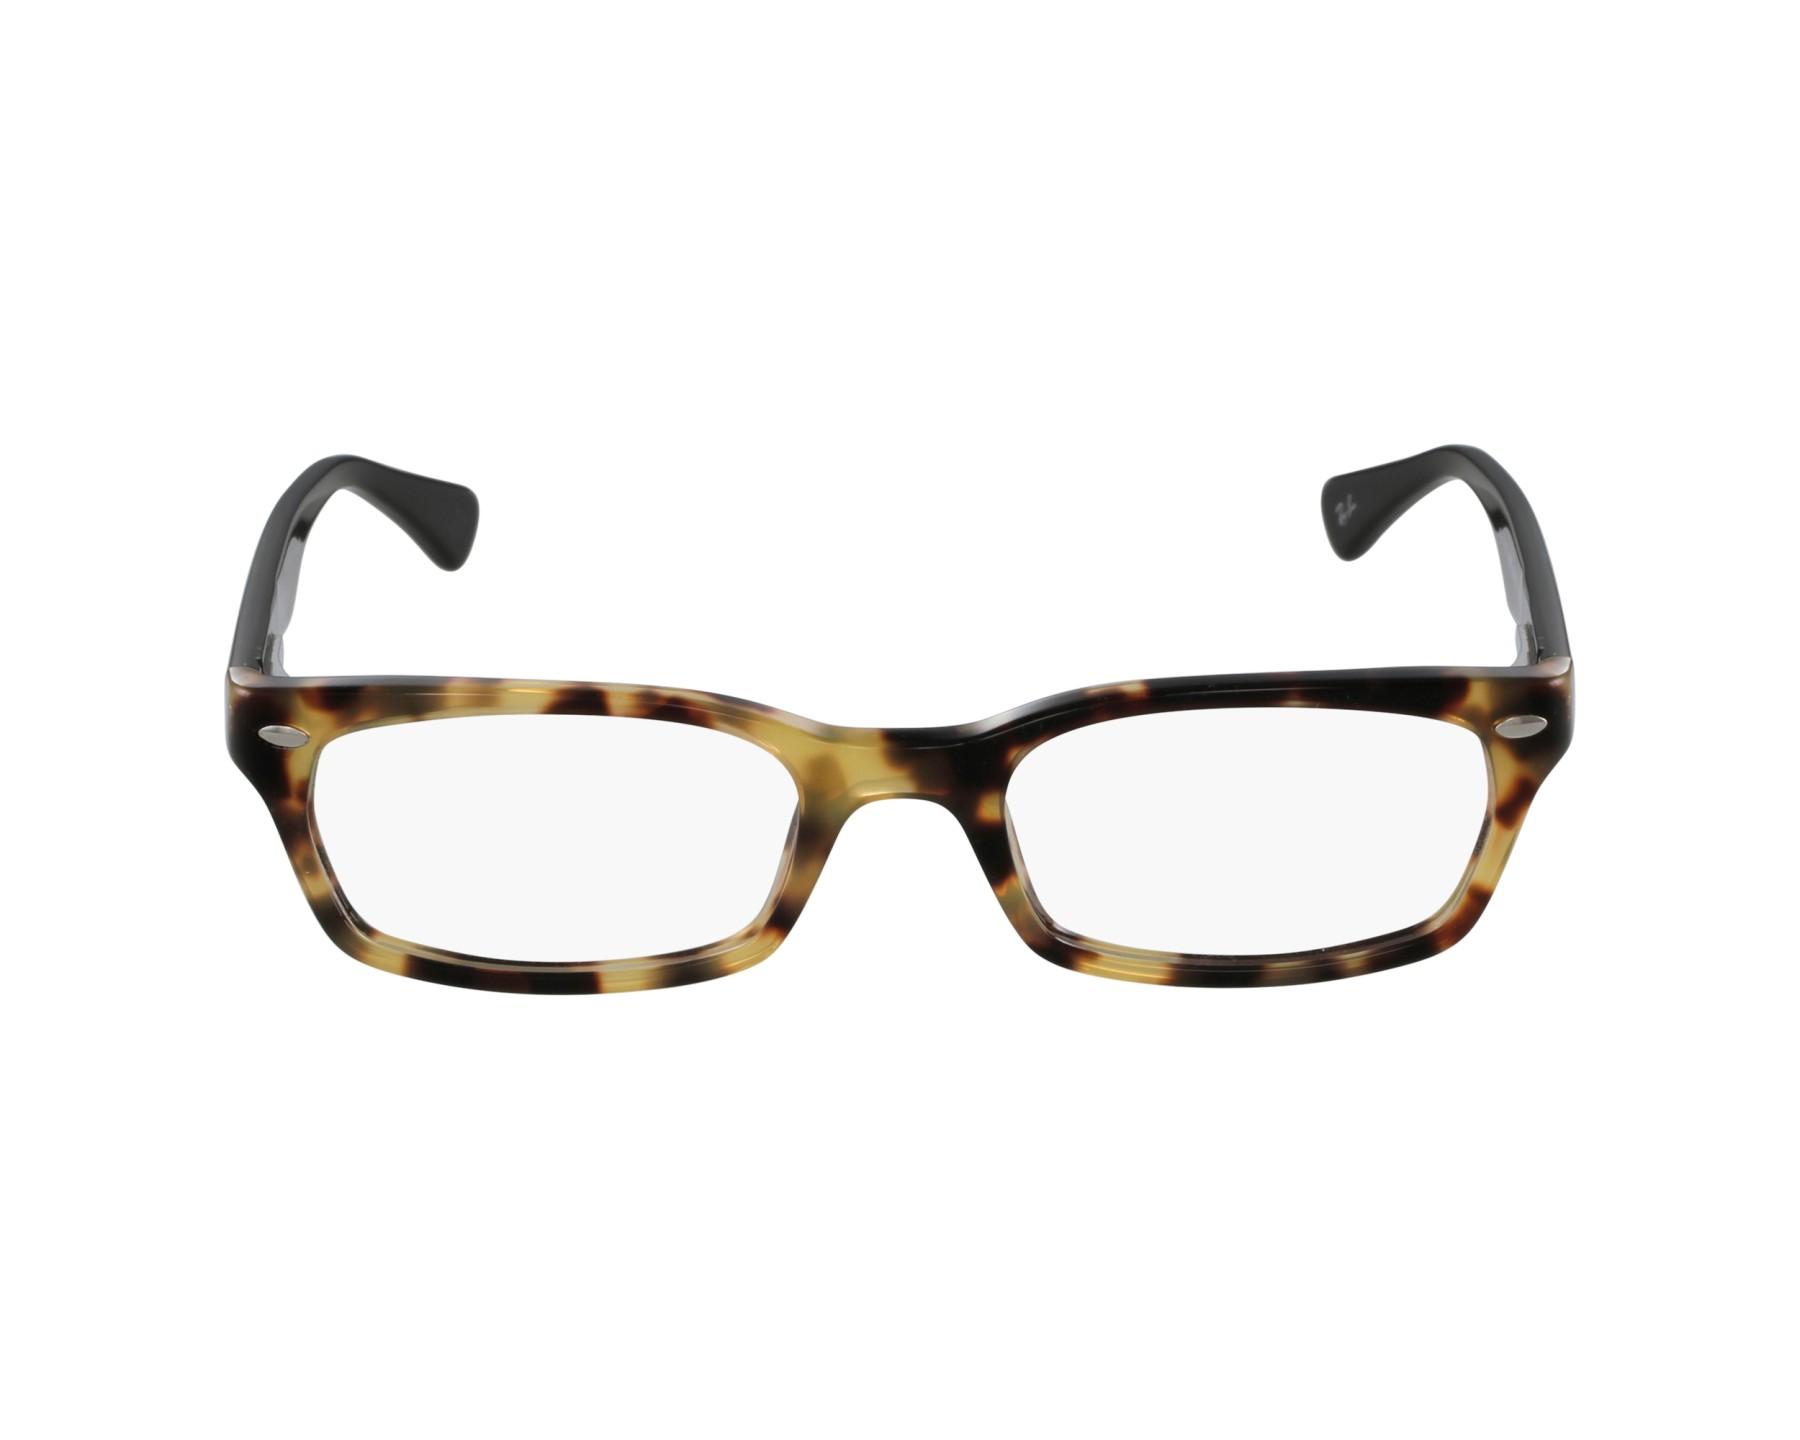 c6facd1a77 eyeglasses Ray-Ban RX-5150 5608 50-19 Havana Honey Black profile view